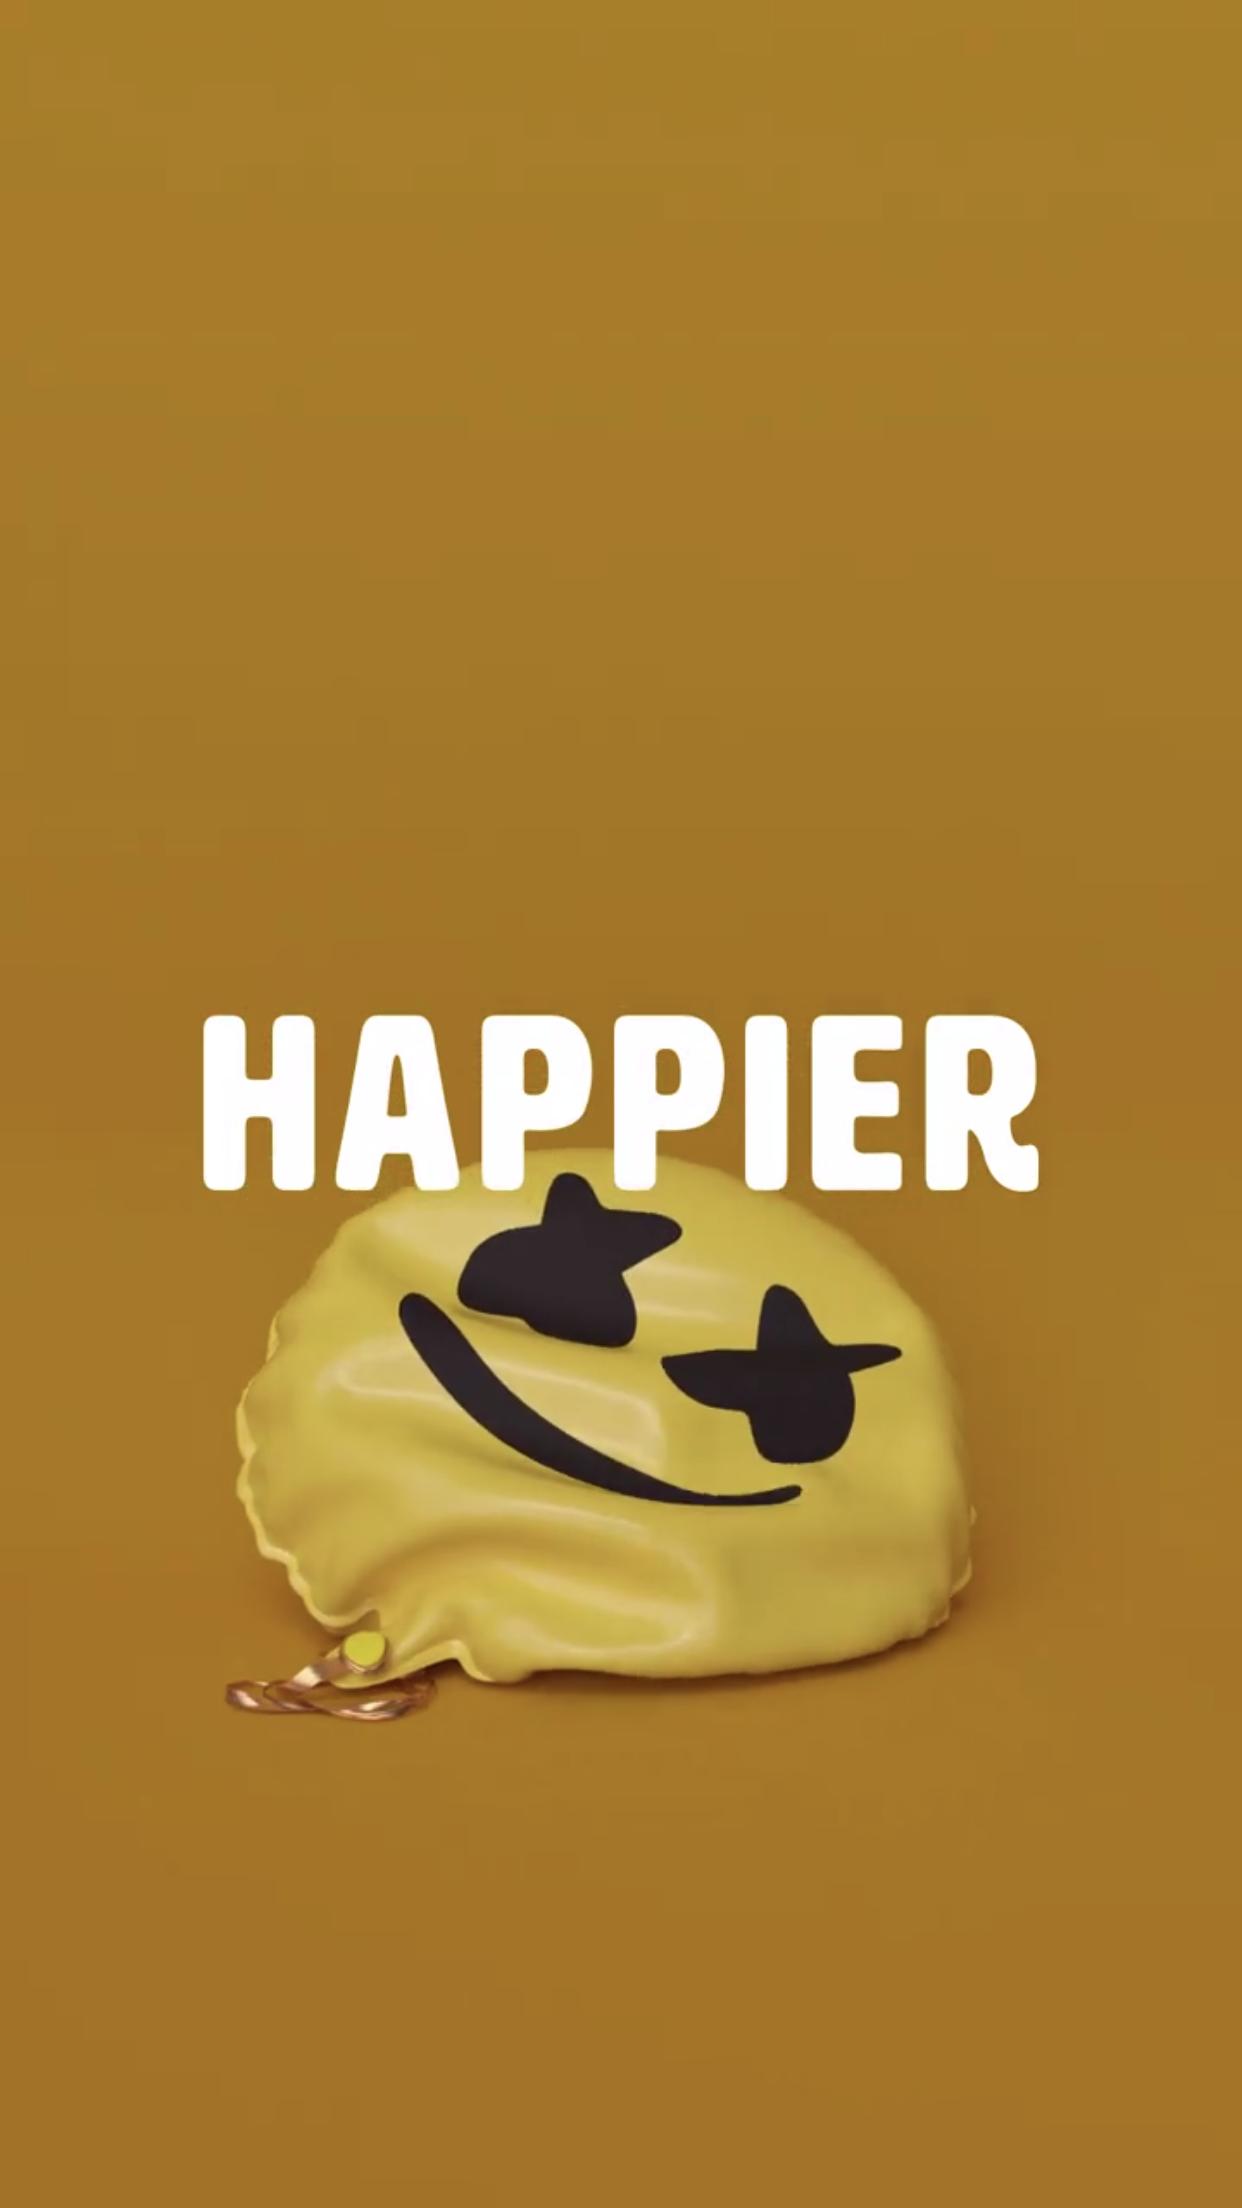 happier wallpaper Flash fondos de pantalla, Fondos de